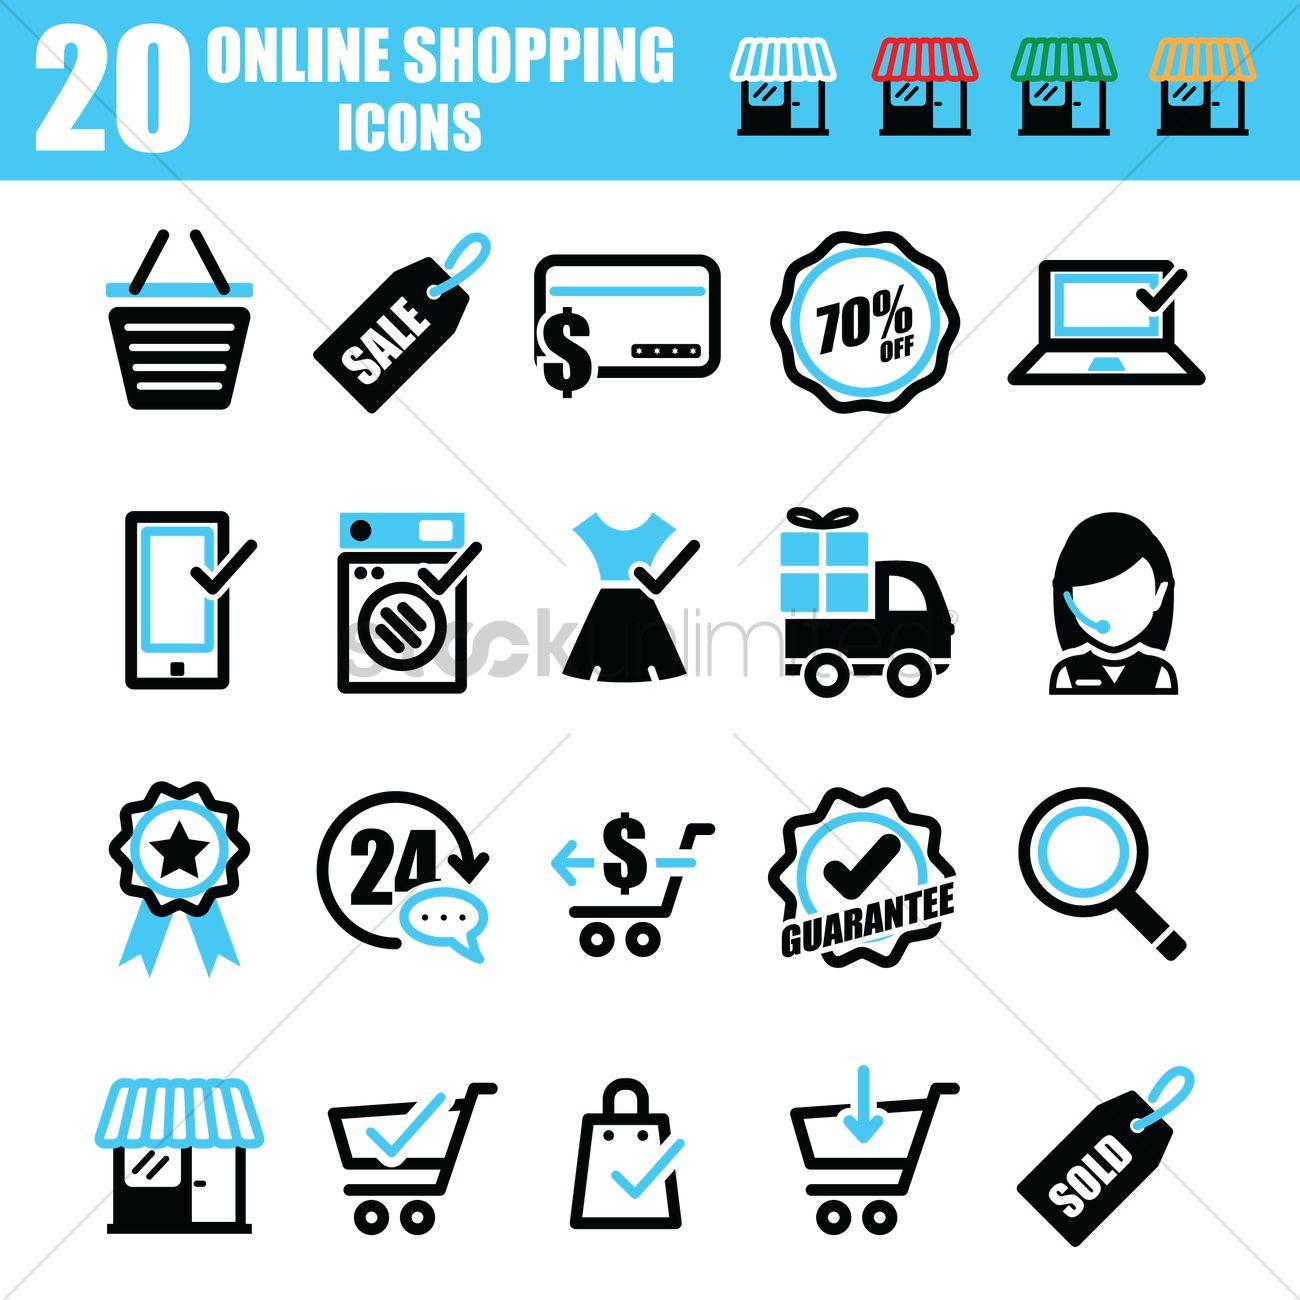 online-shopping-icons_1523236.jpg